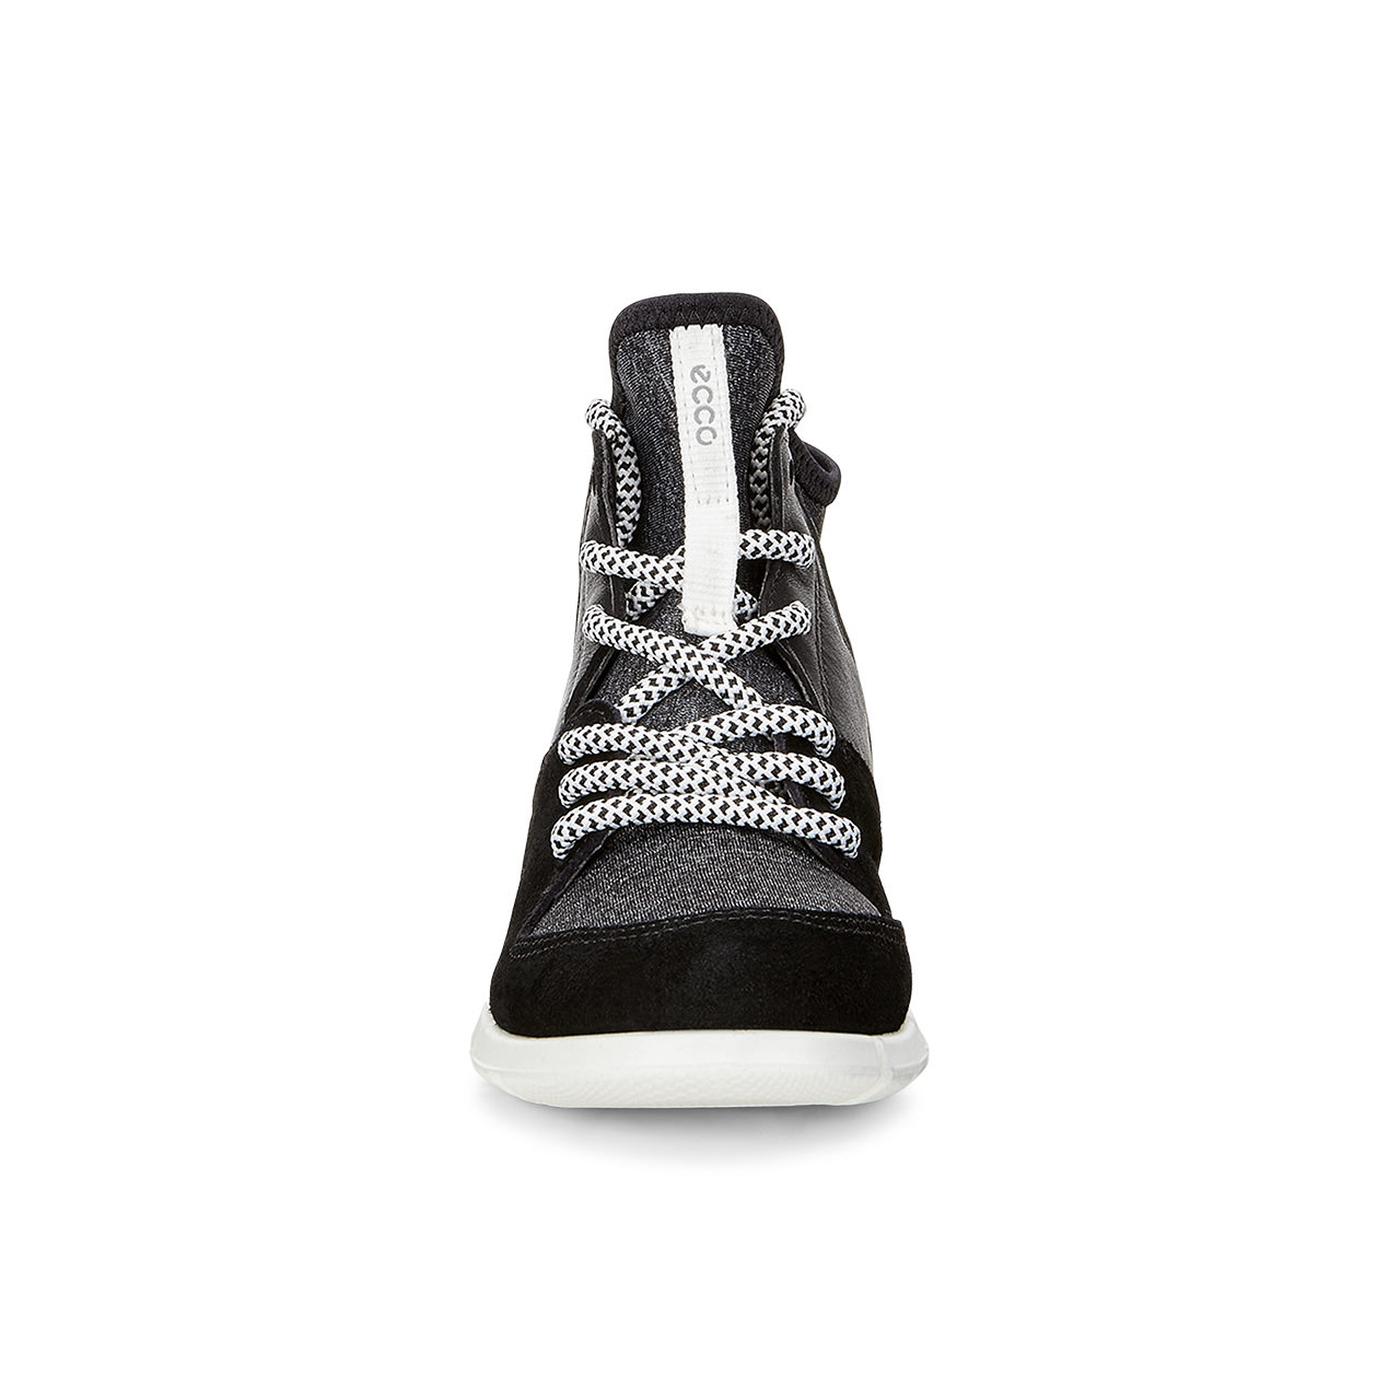 Sneaker ECCO Intrinsic pour enfants